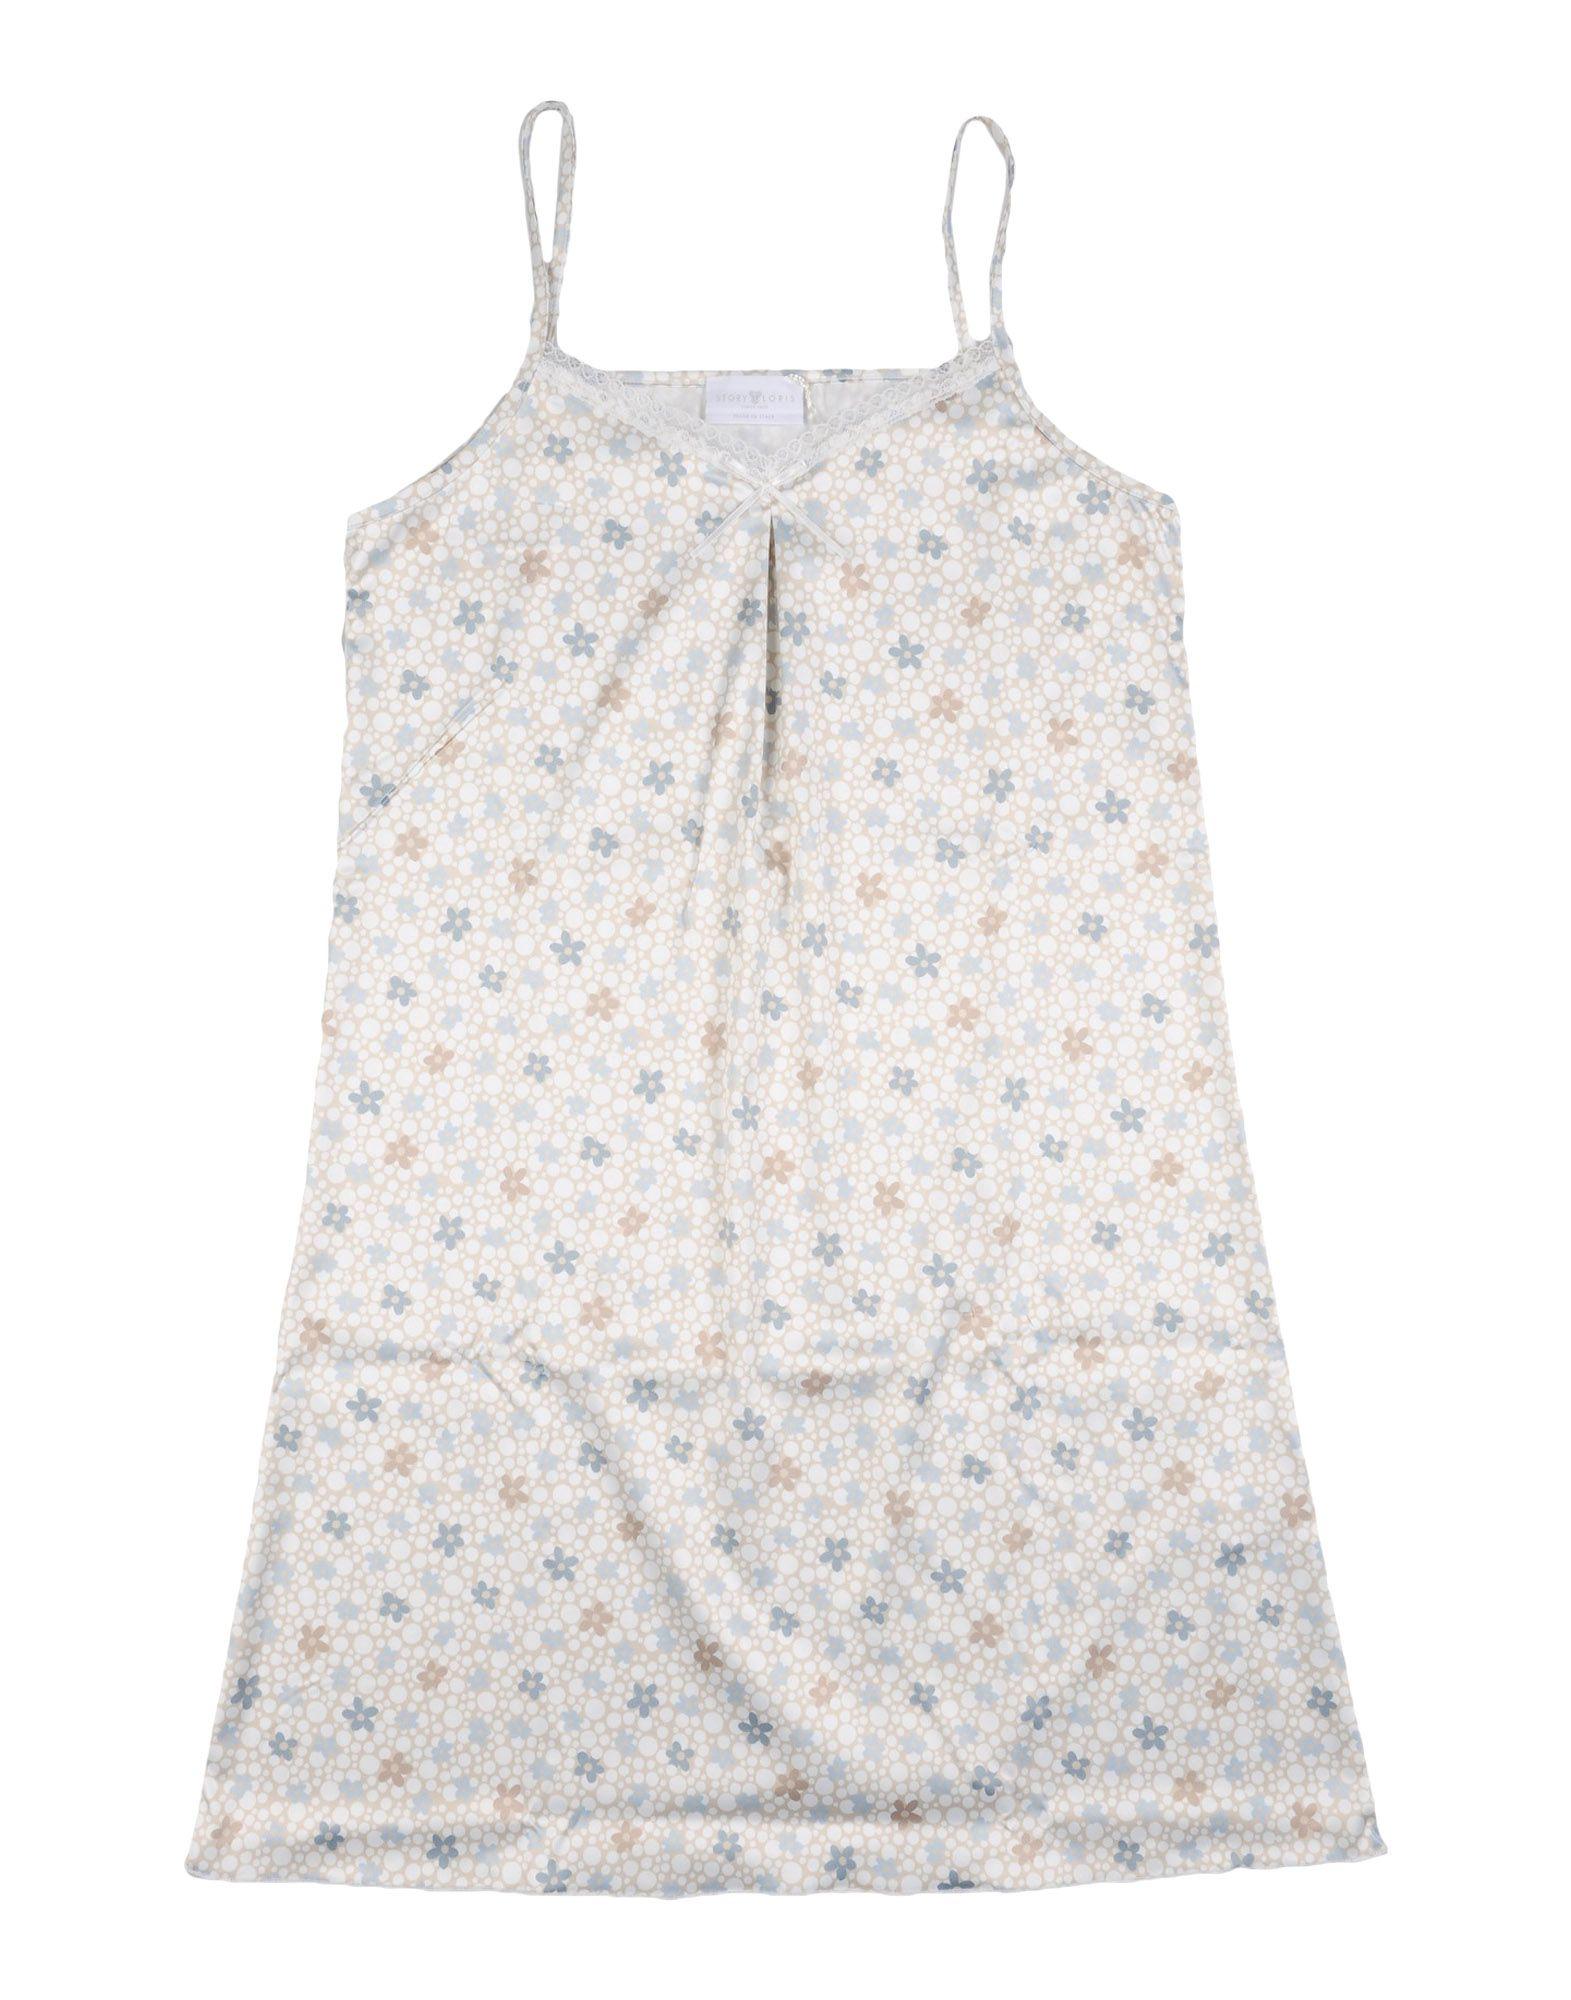 STORY LORIS Nightgowns